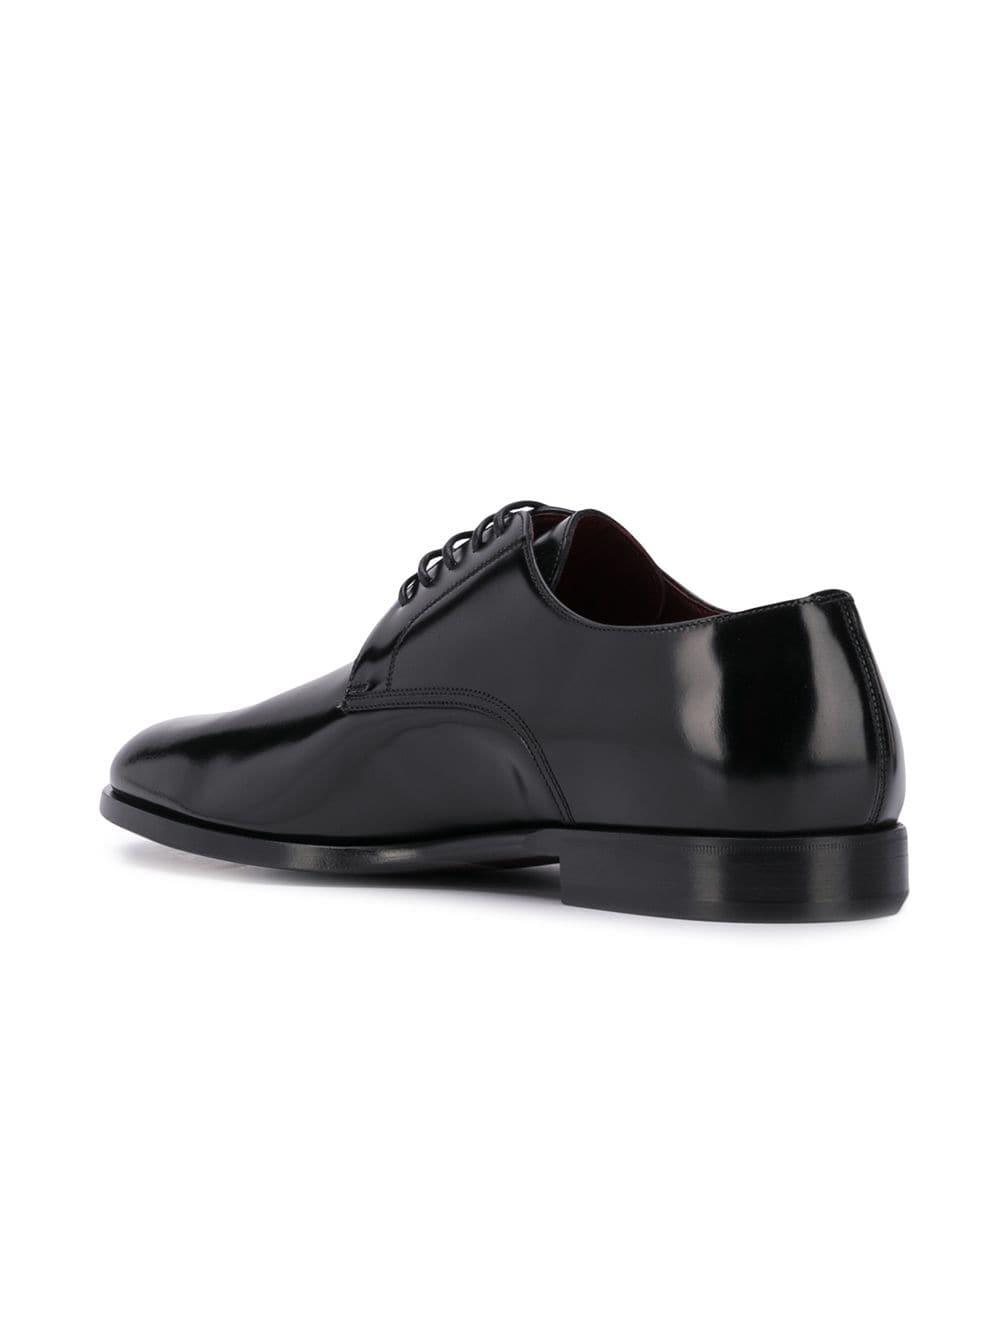 scarpe derby in pelle nera con punta a mandorla DOLCE & GABBANA | Scarpa | A10432-A120380999